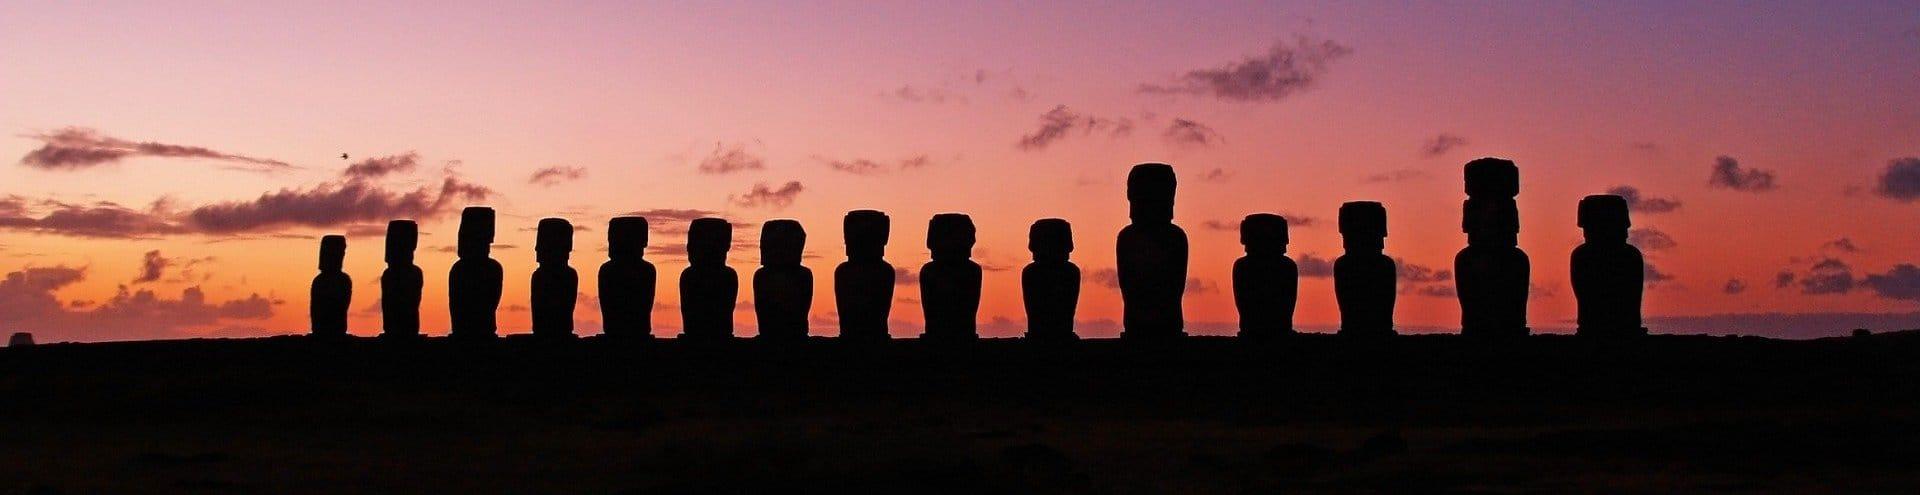 Easter Island Chile UNESCO